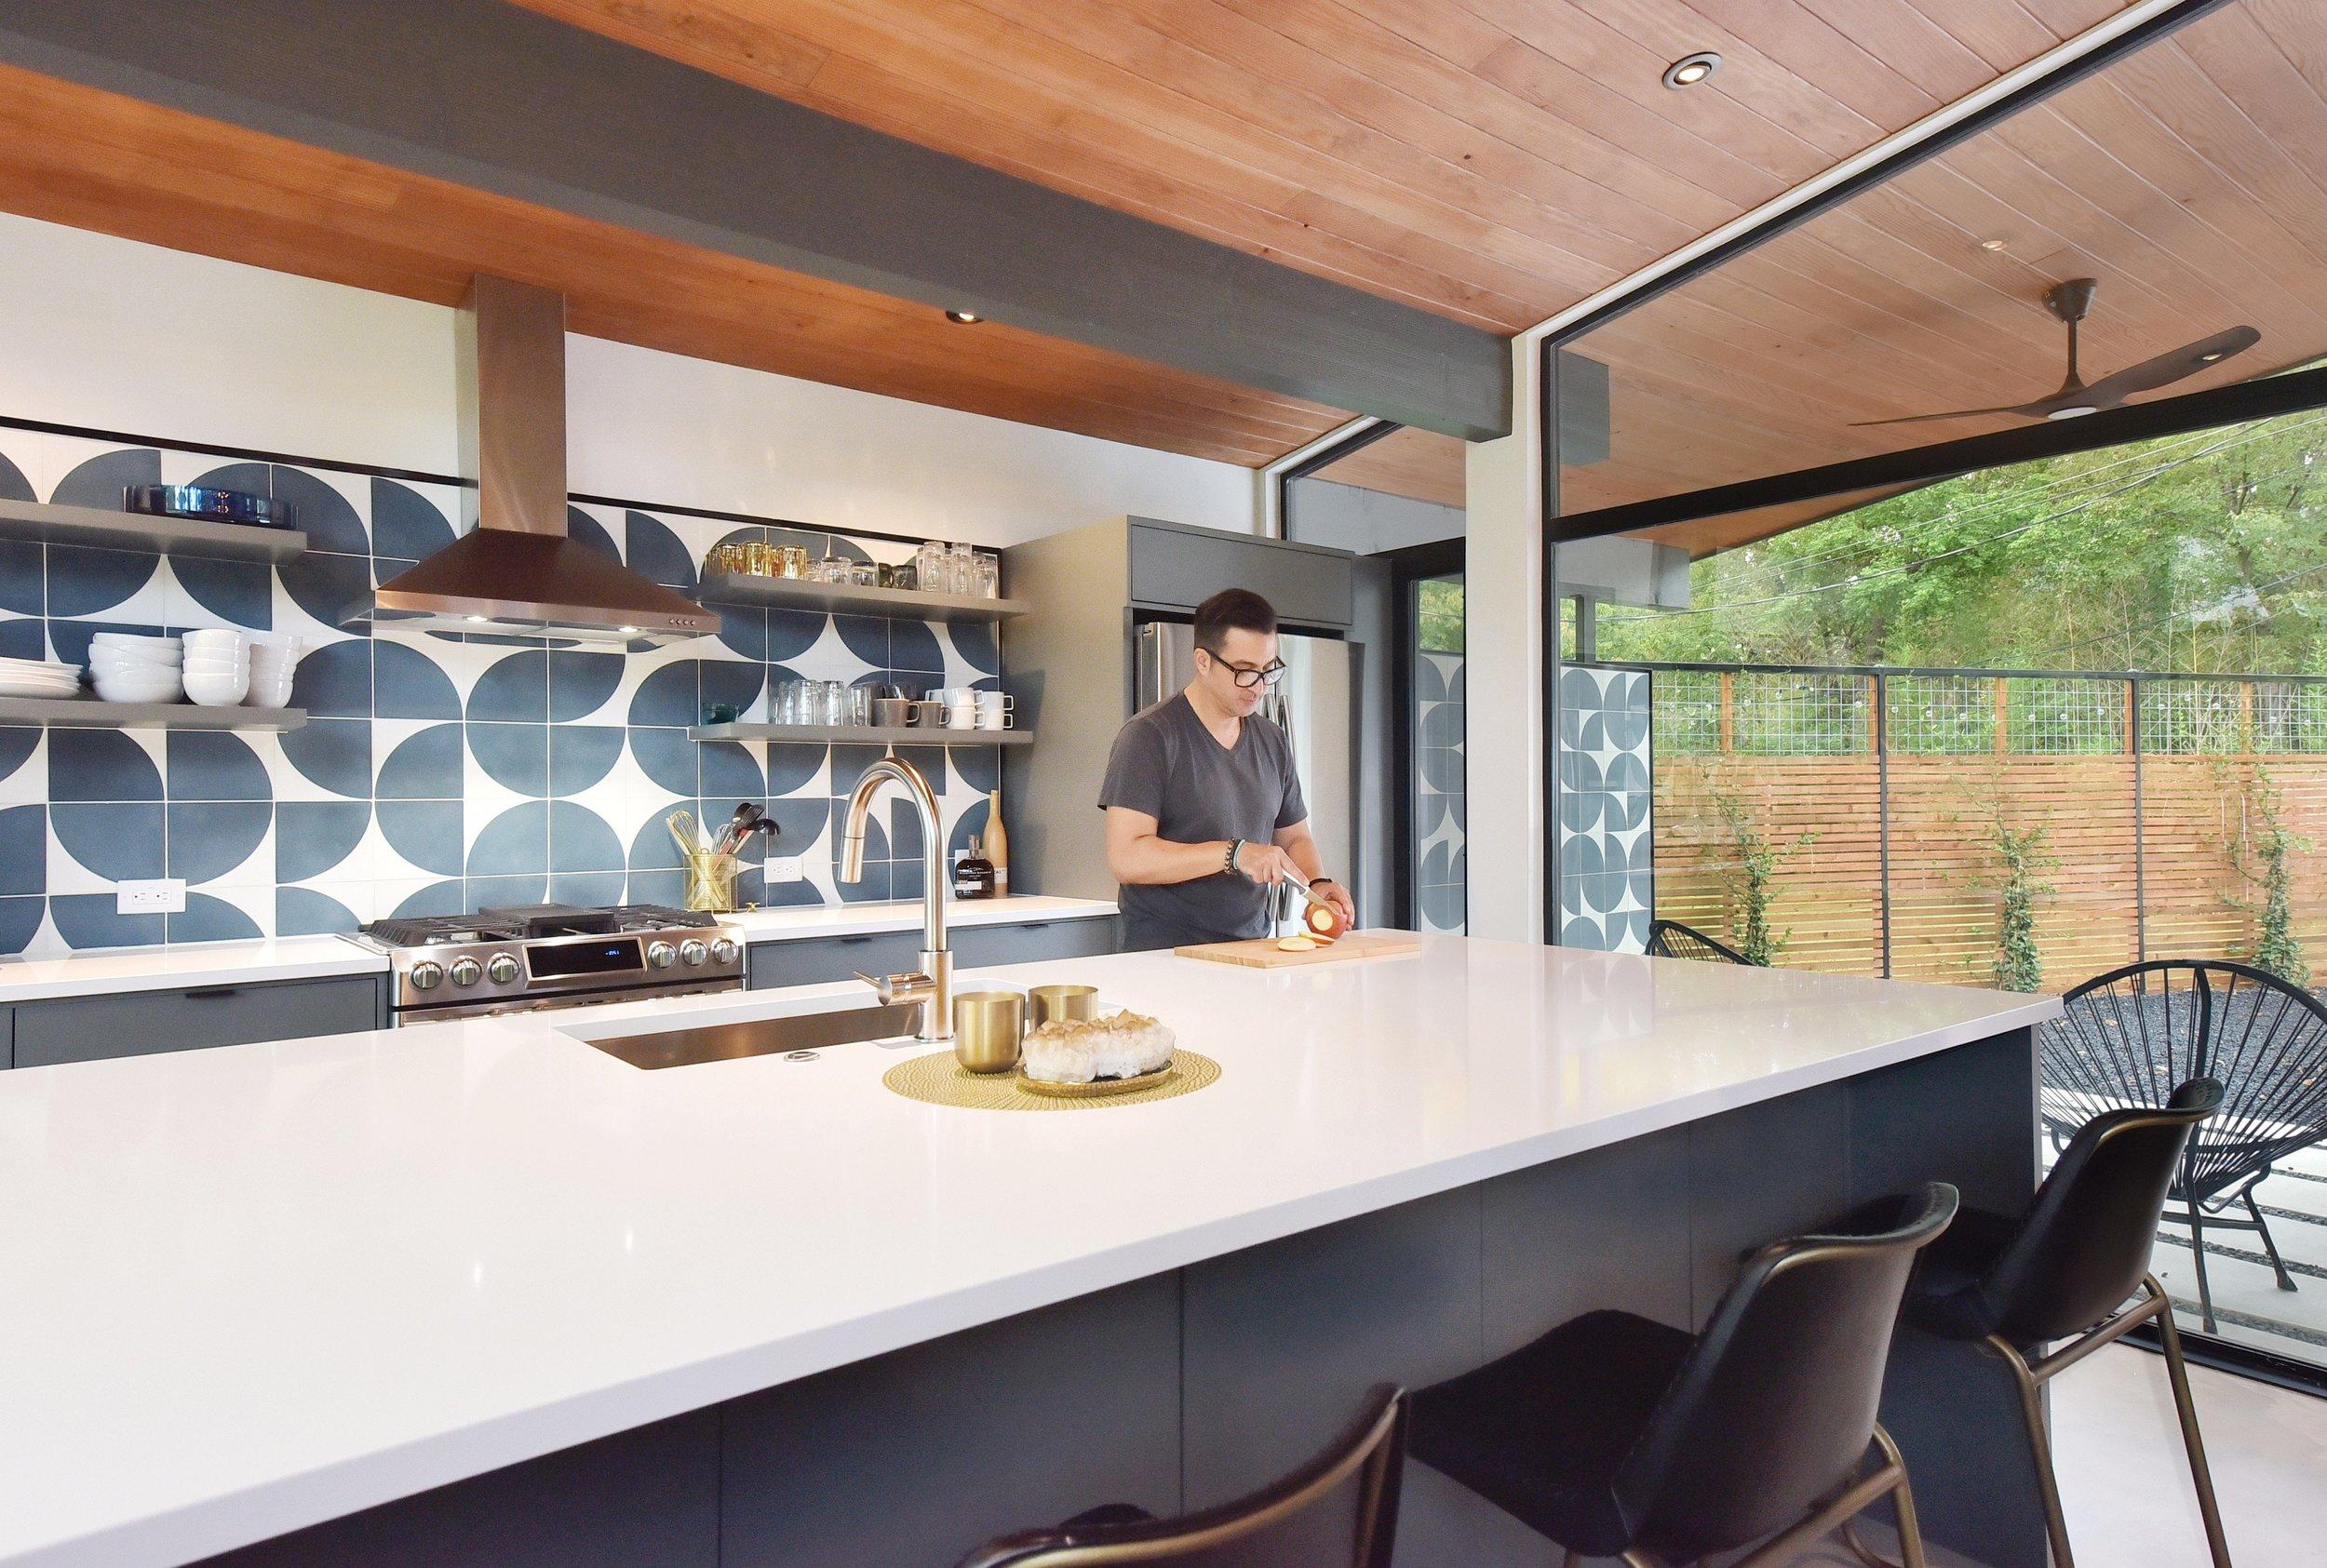 09 Re-Open House by Matt Fajkus Architecture - Photo by Twist Tours.jpg